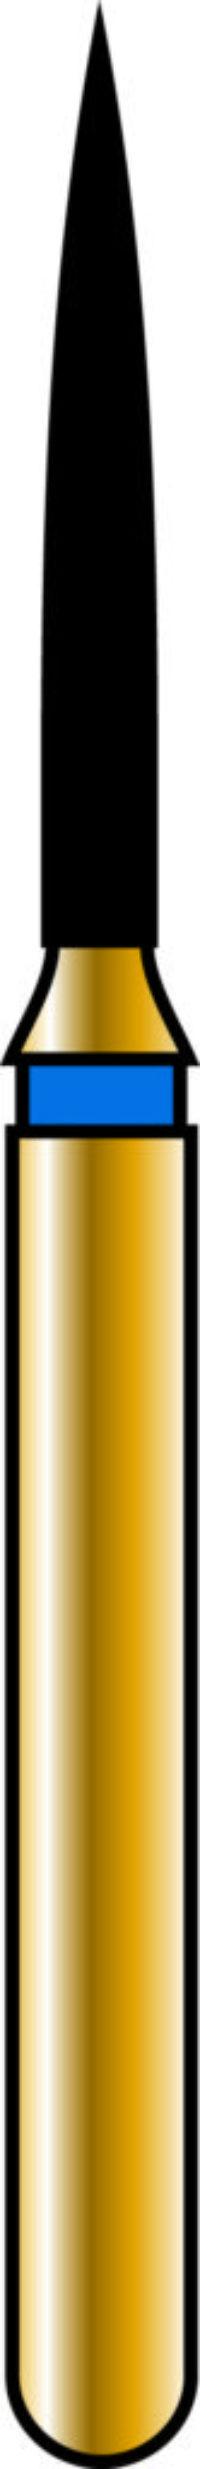 Flame 10-8mm Gold Diamond Bur